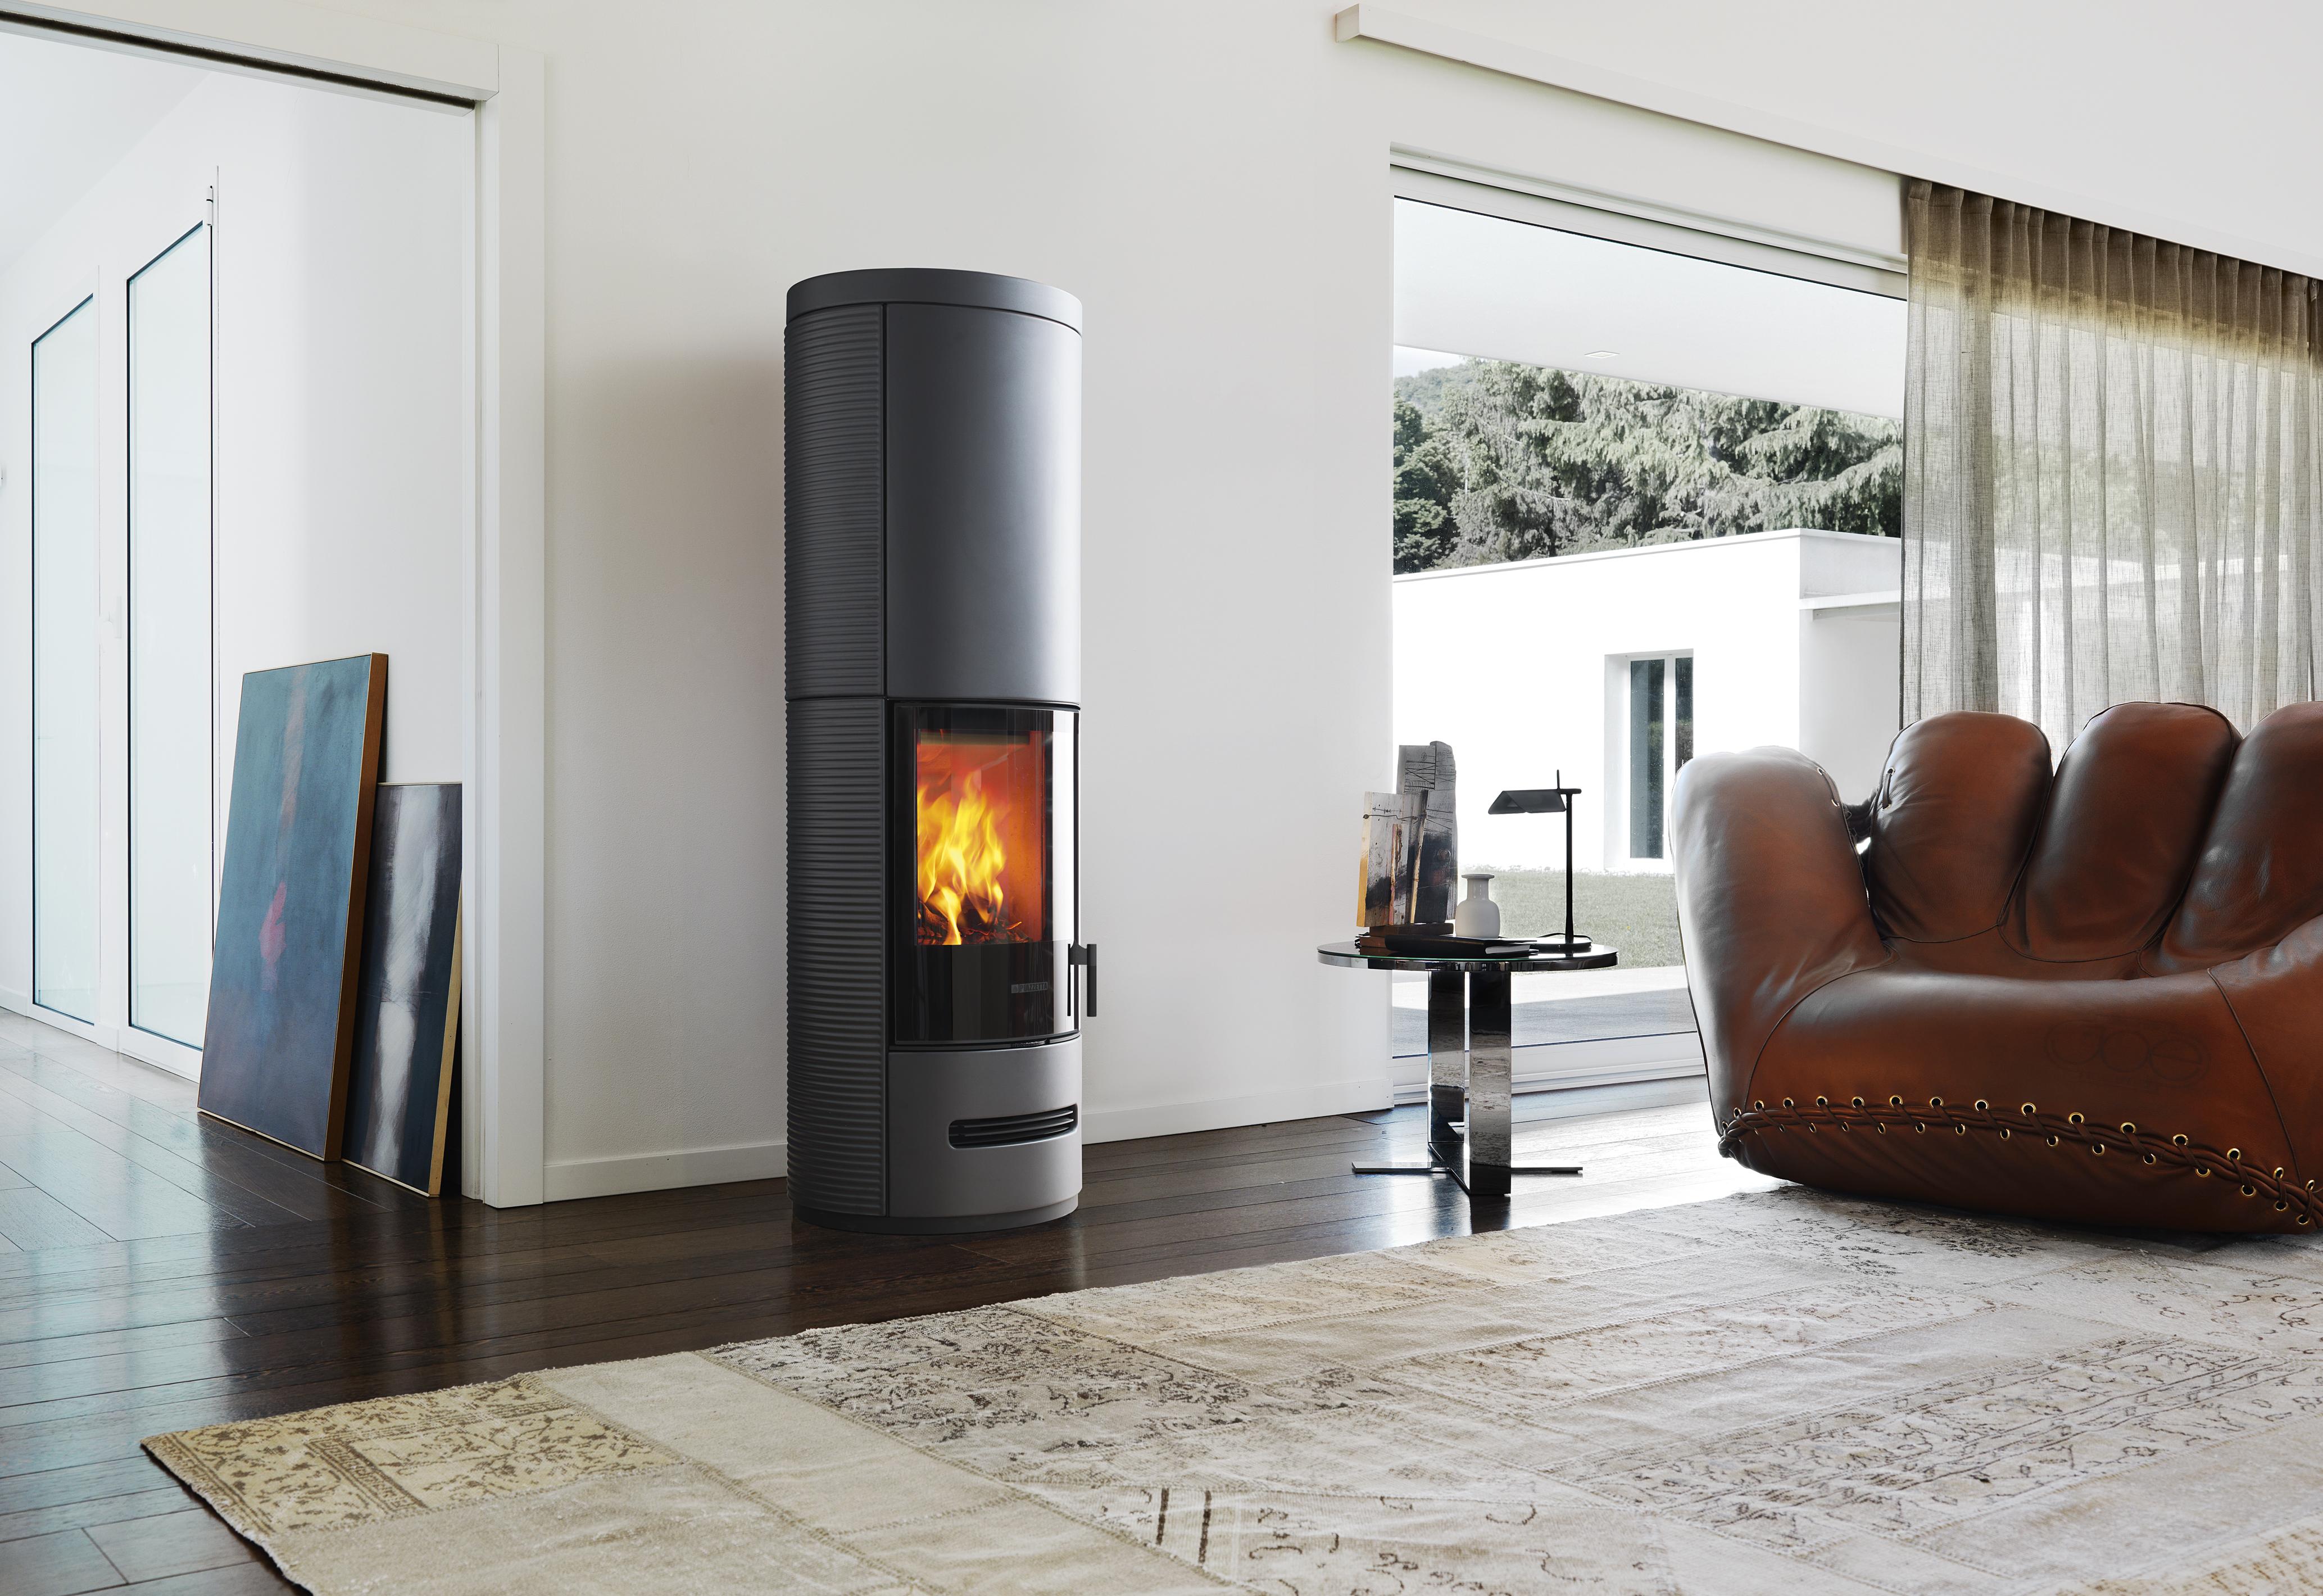 e-929-dh-wood-burning-stove-piazzetta-209000-relb3f3b35e (1)